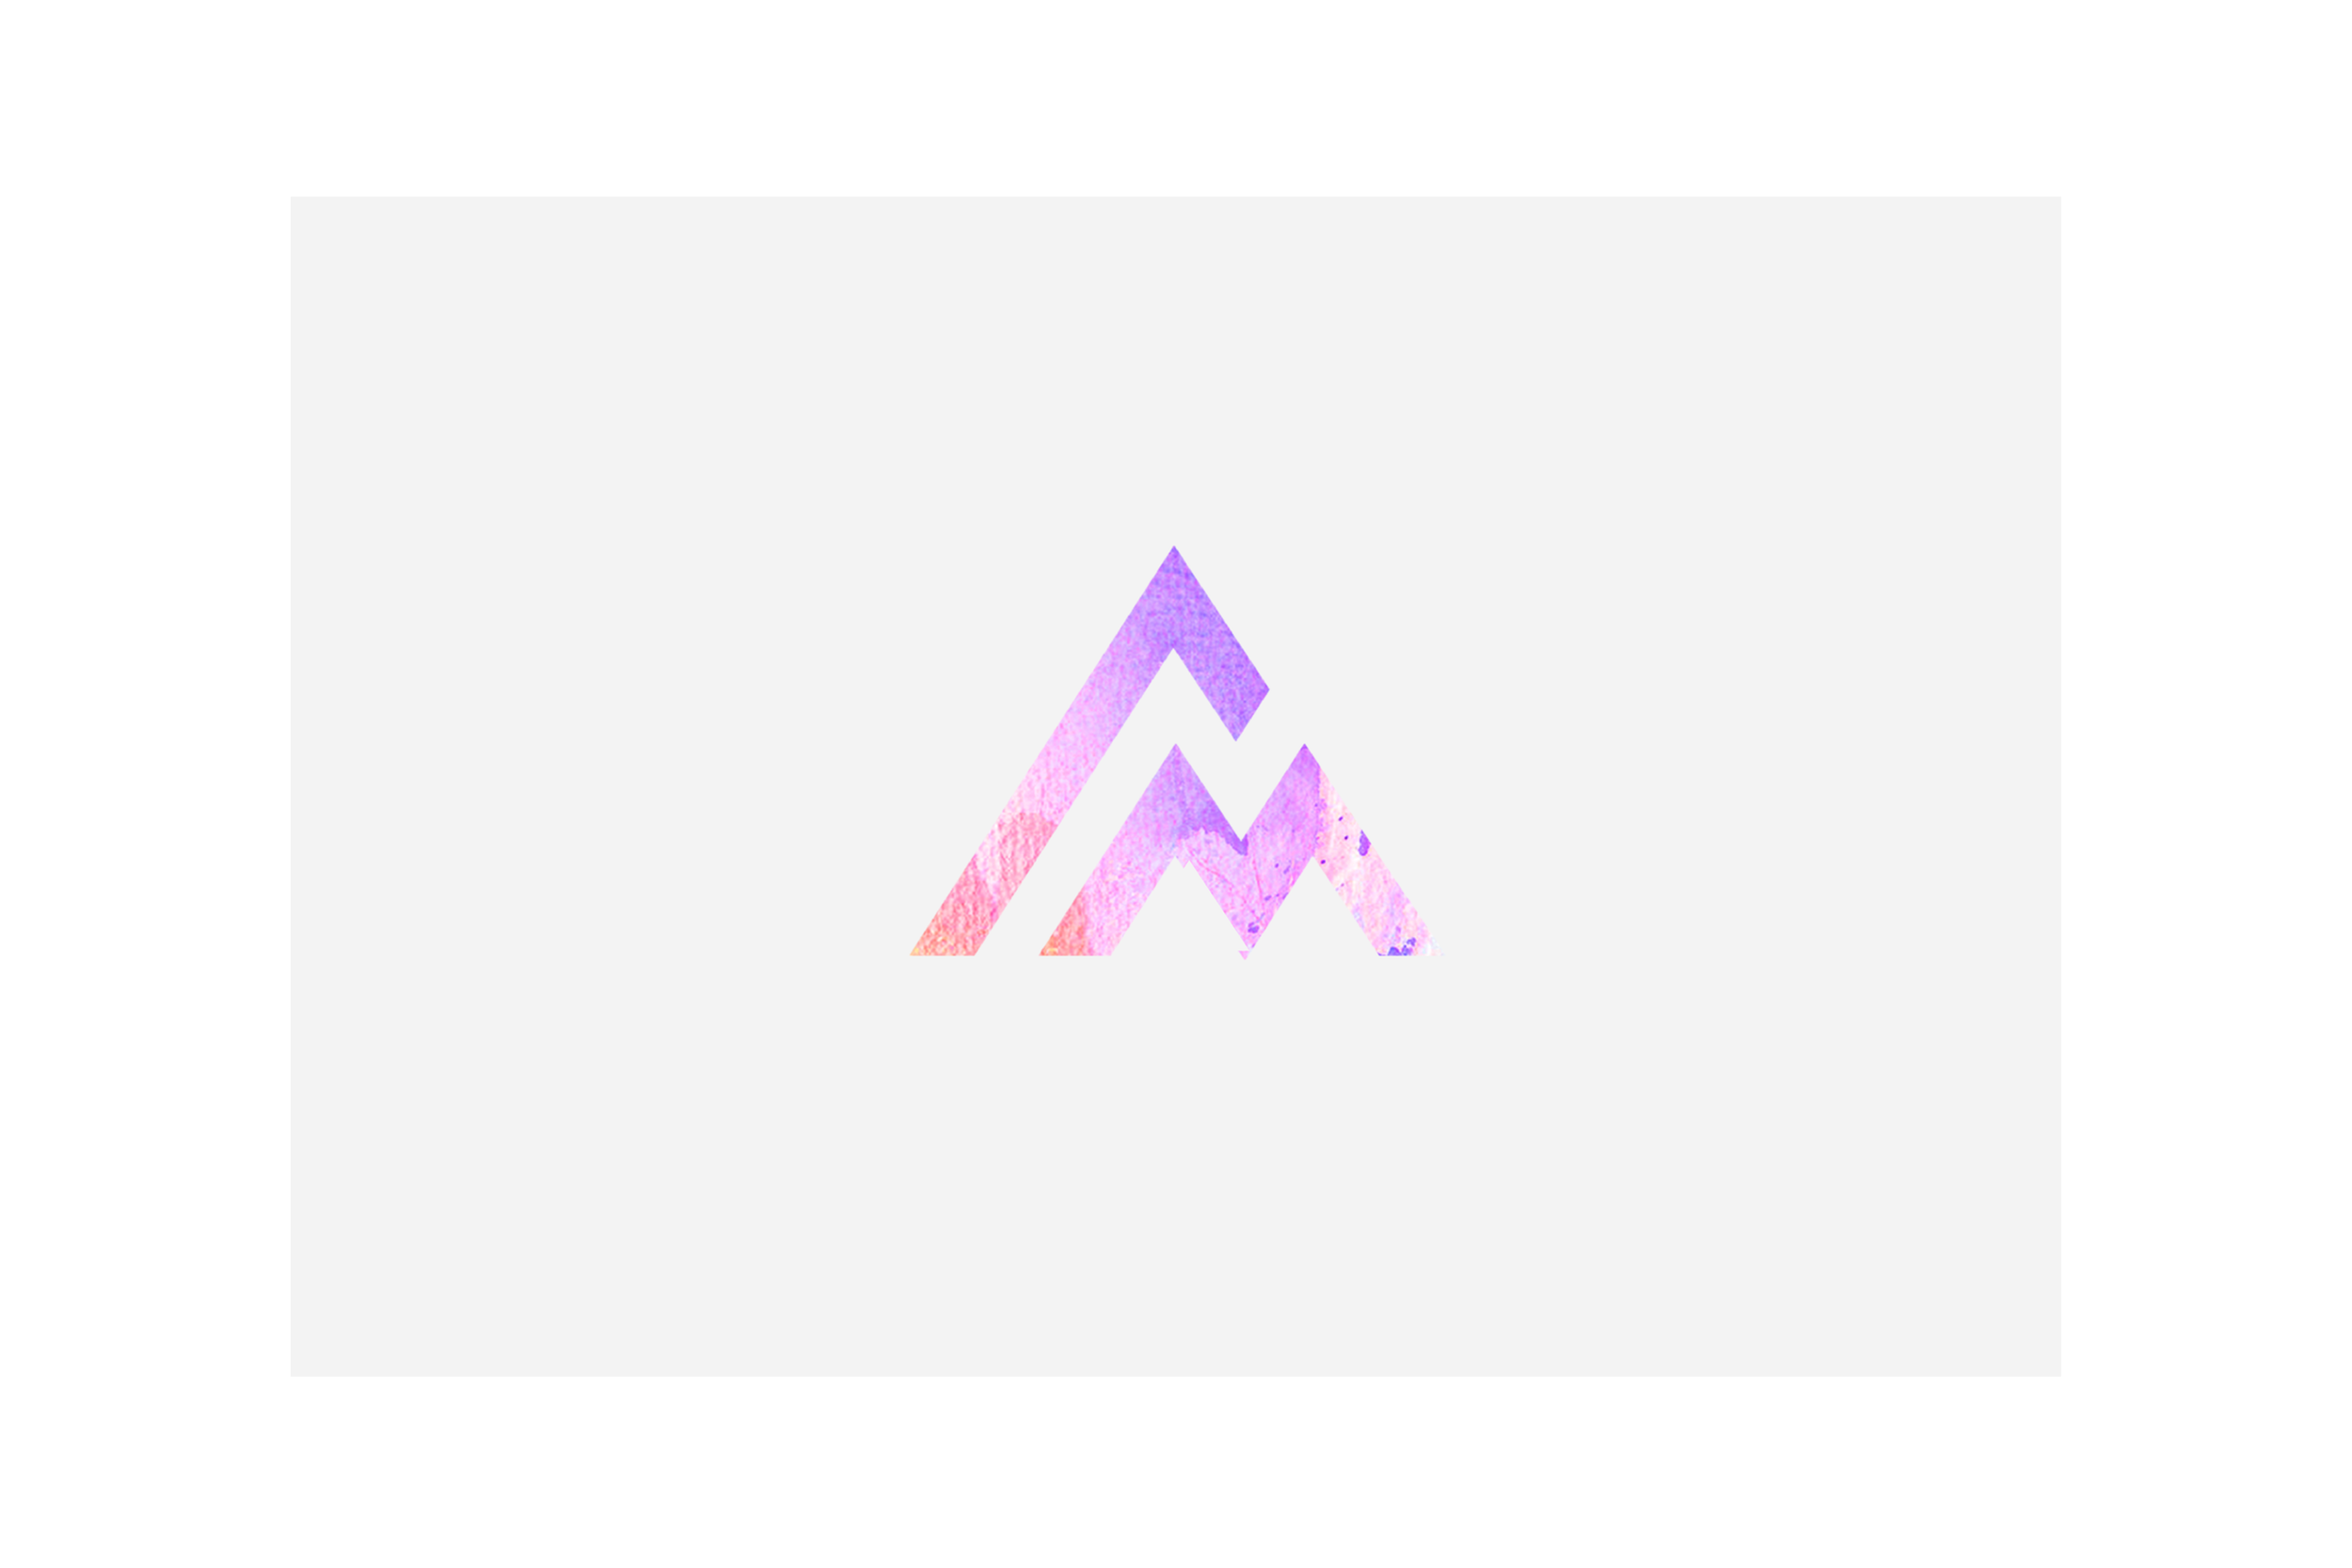 logos and marks_v4-12.png